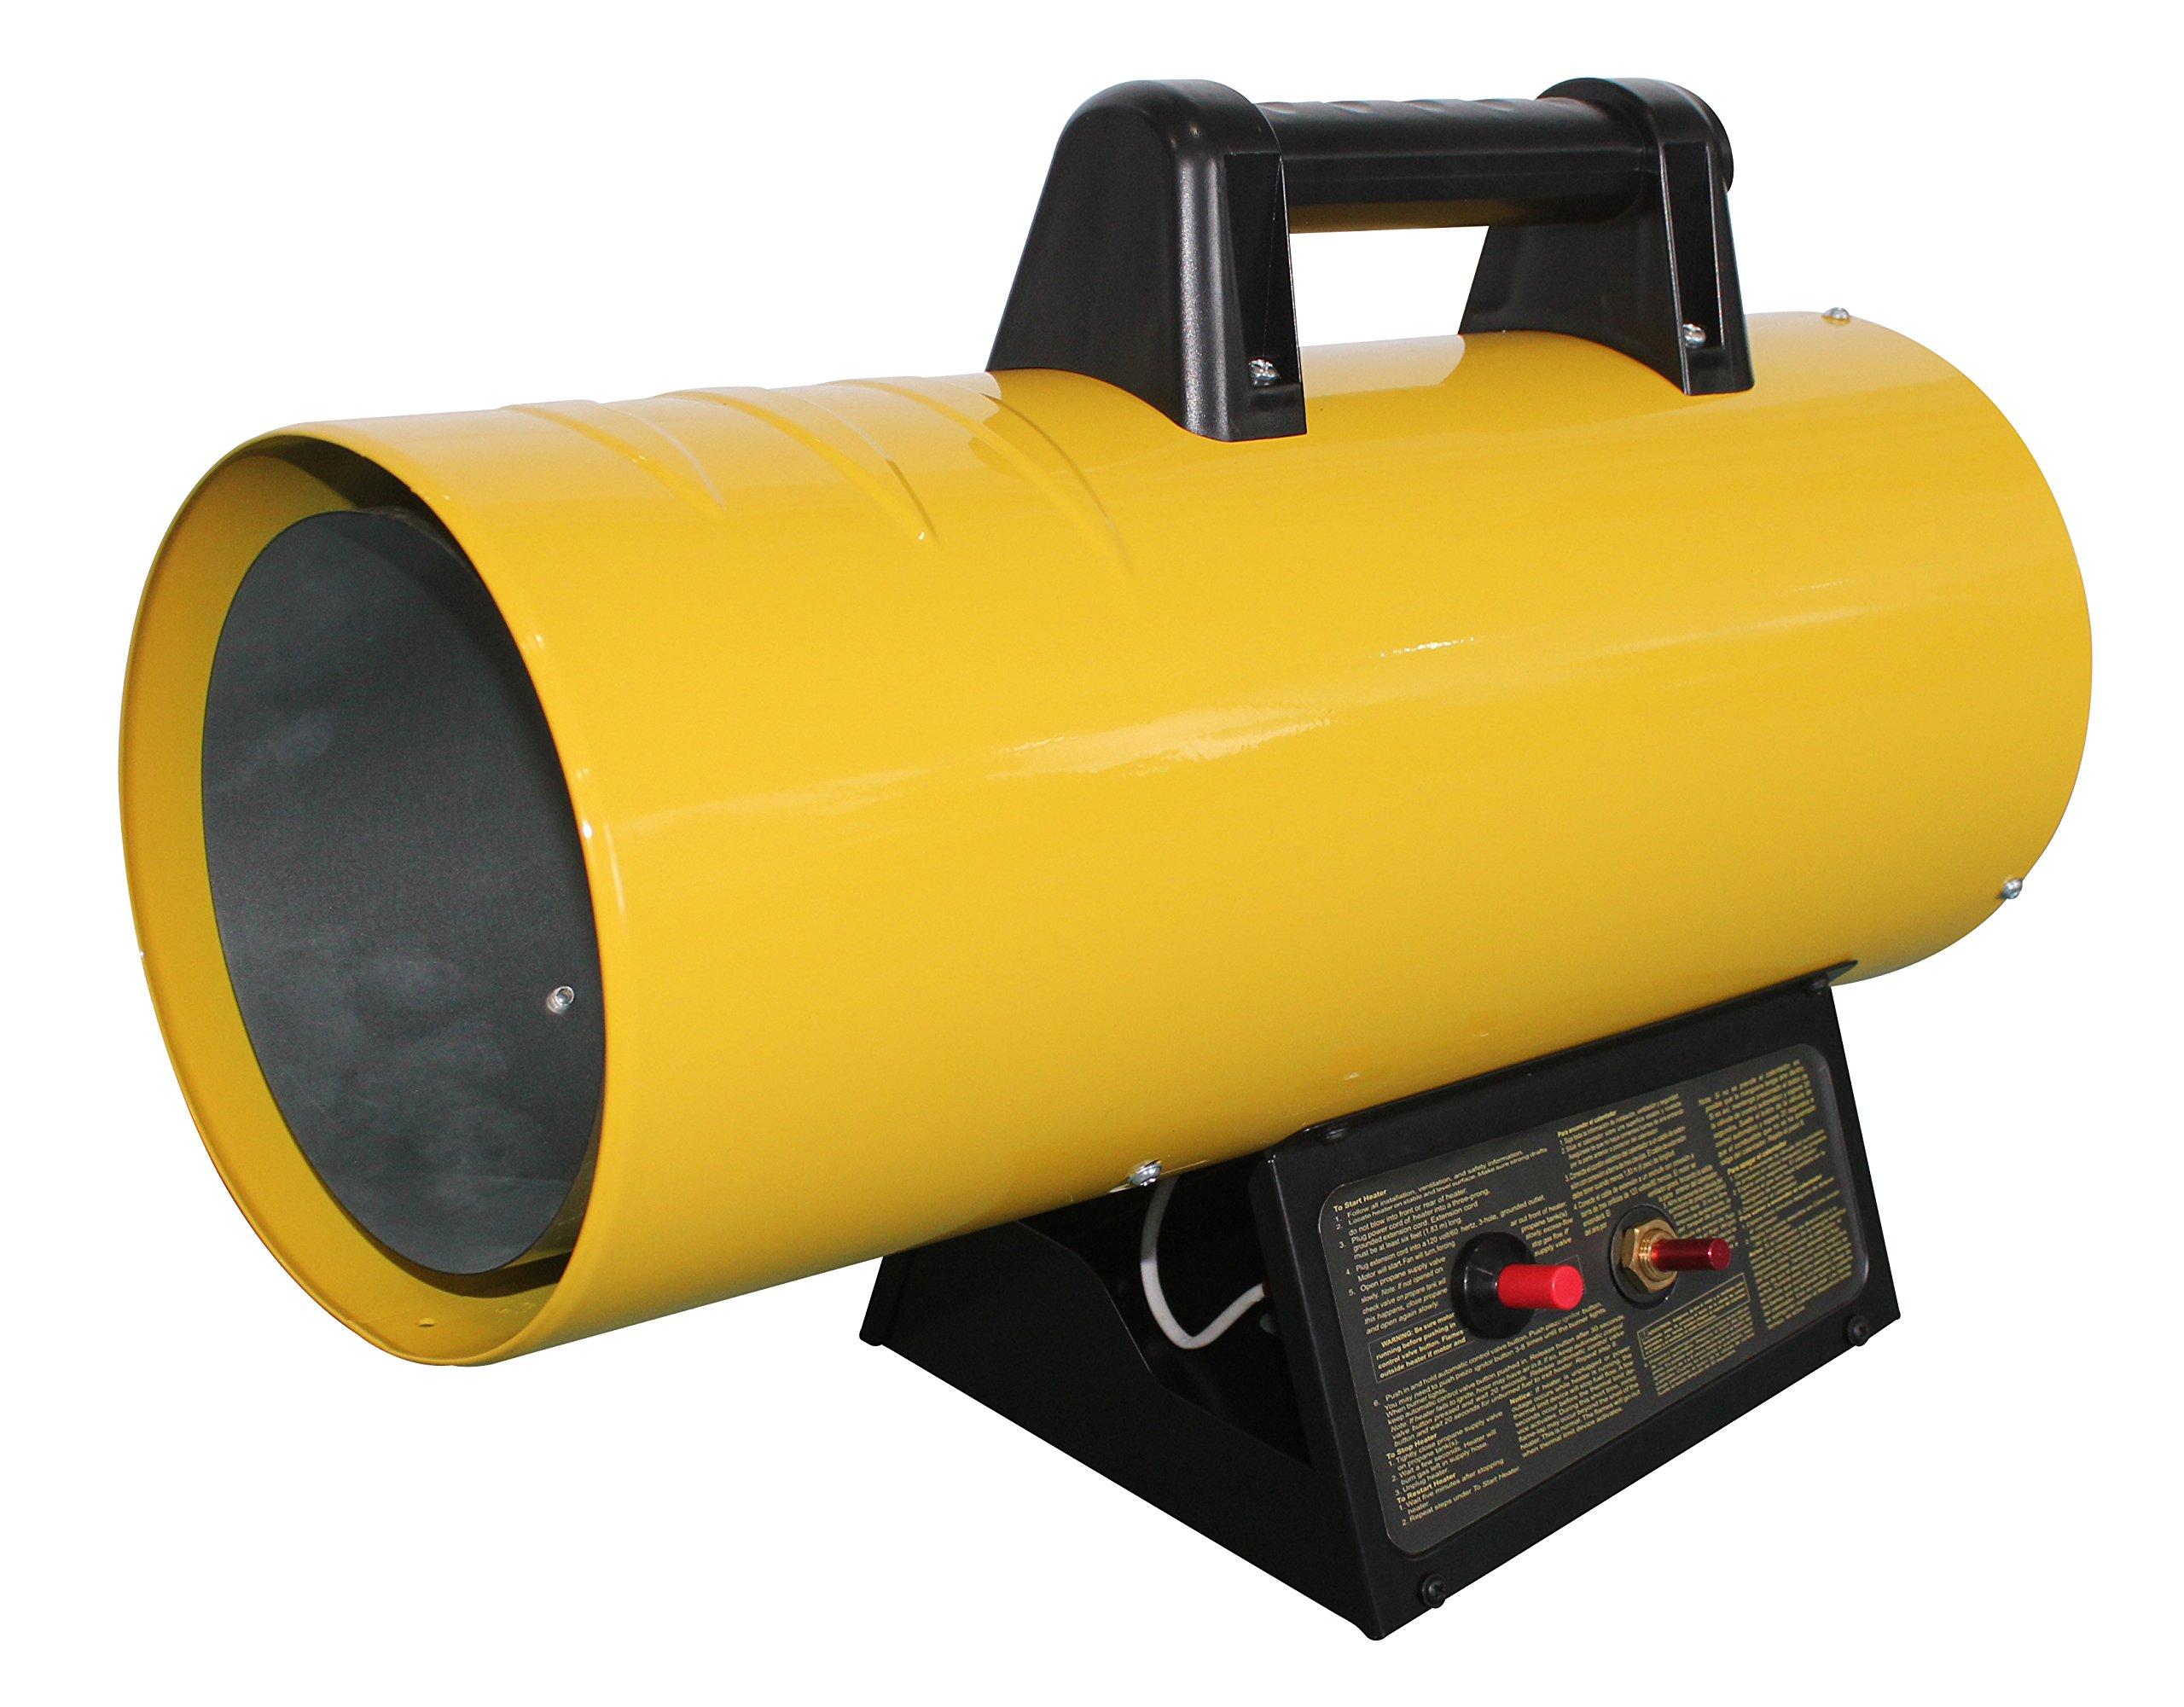 AZ Patio HIL-SHOP-LP40 40000 Btu Propane Forced Air Shop Heater